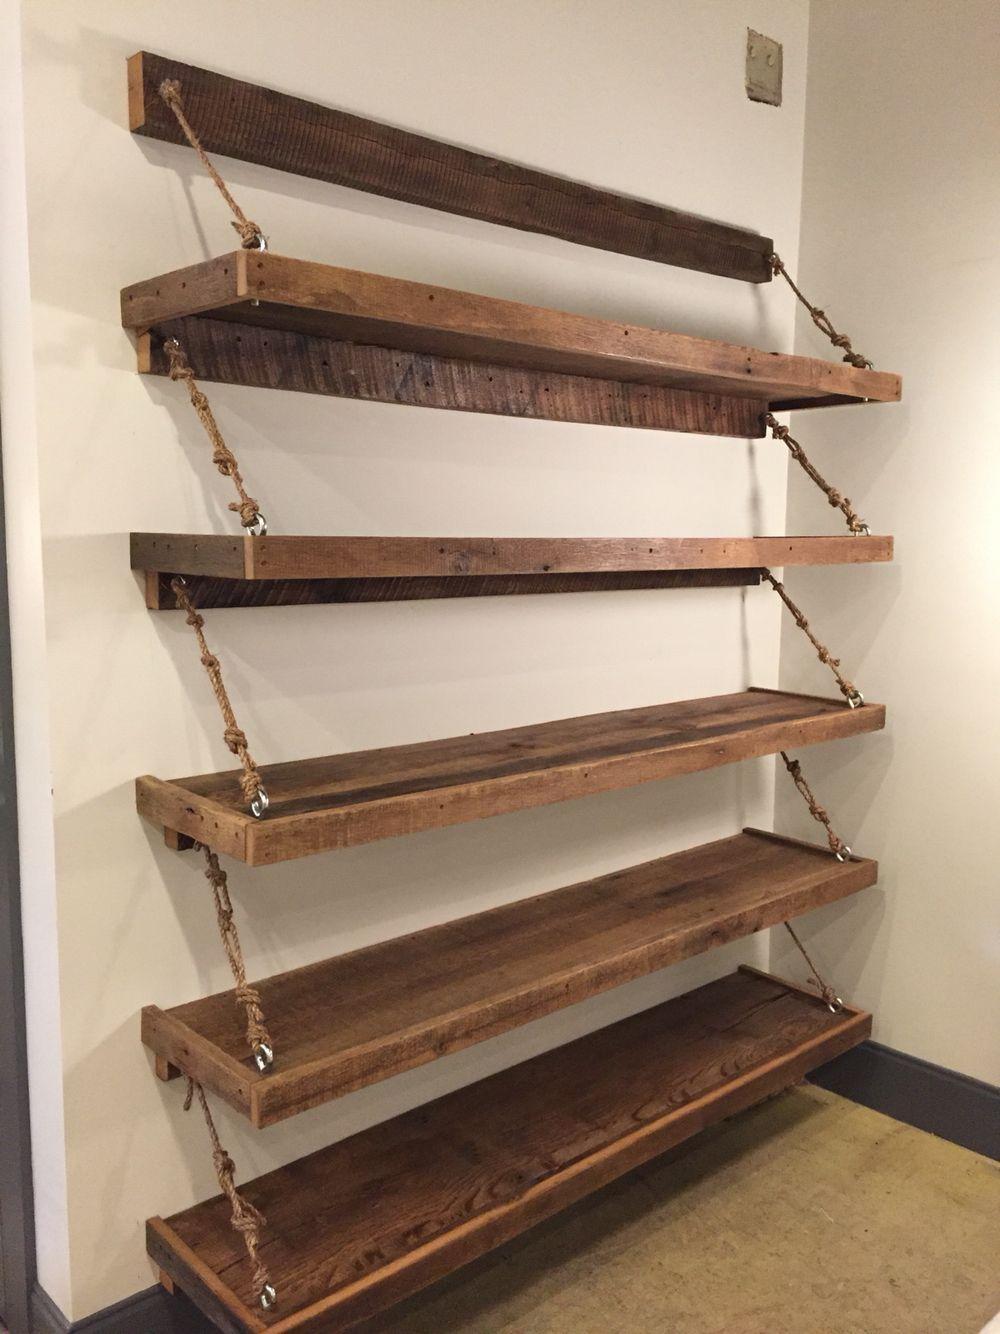 reclaimed wood rope shelves for the home hem inredning hus b thus. Black Bedroom Furniture Sets. Home Design Ideas